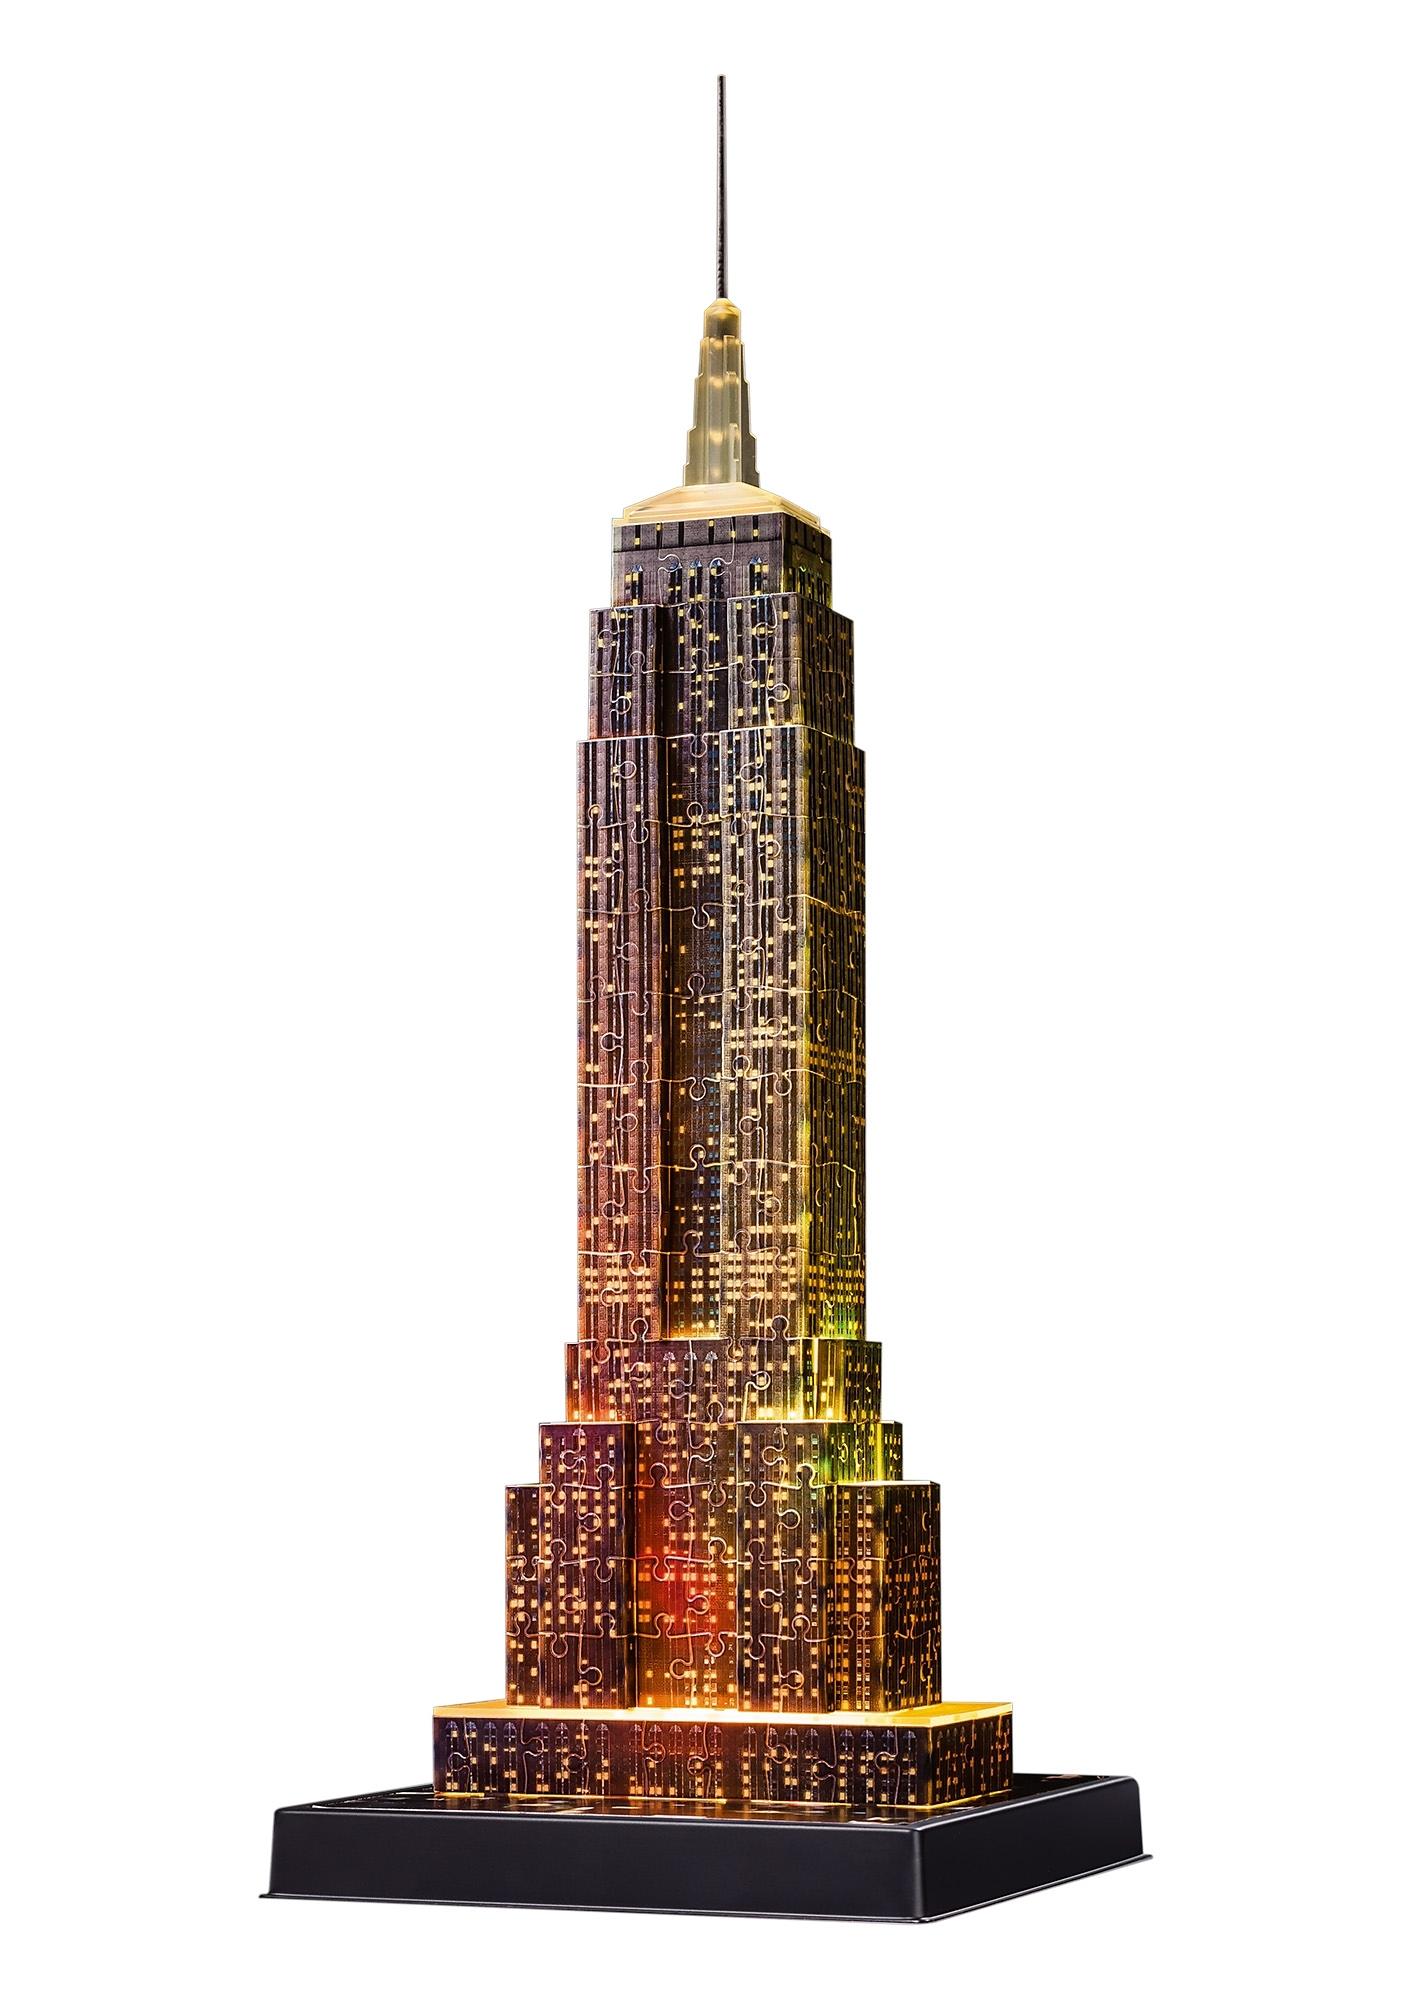 RAVENSBURGER 3D-puzzel Empire State Building in de online winkel | OTTO